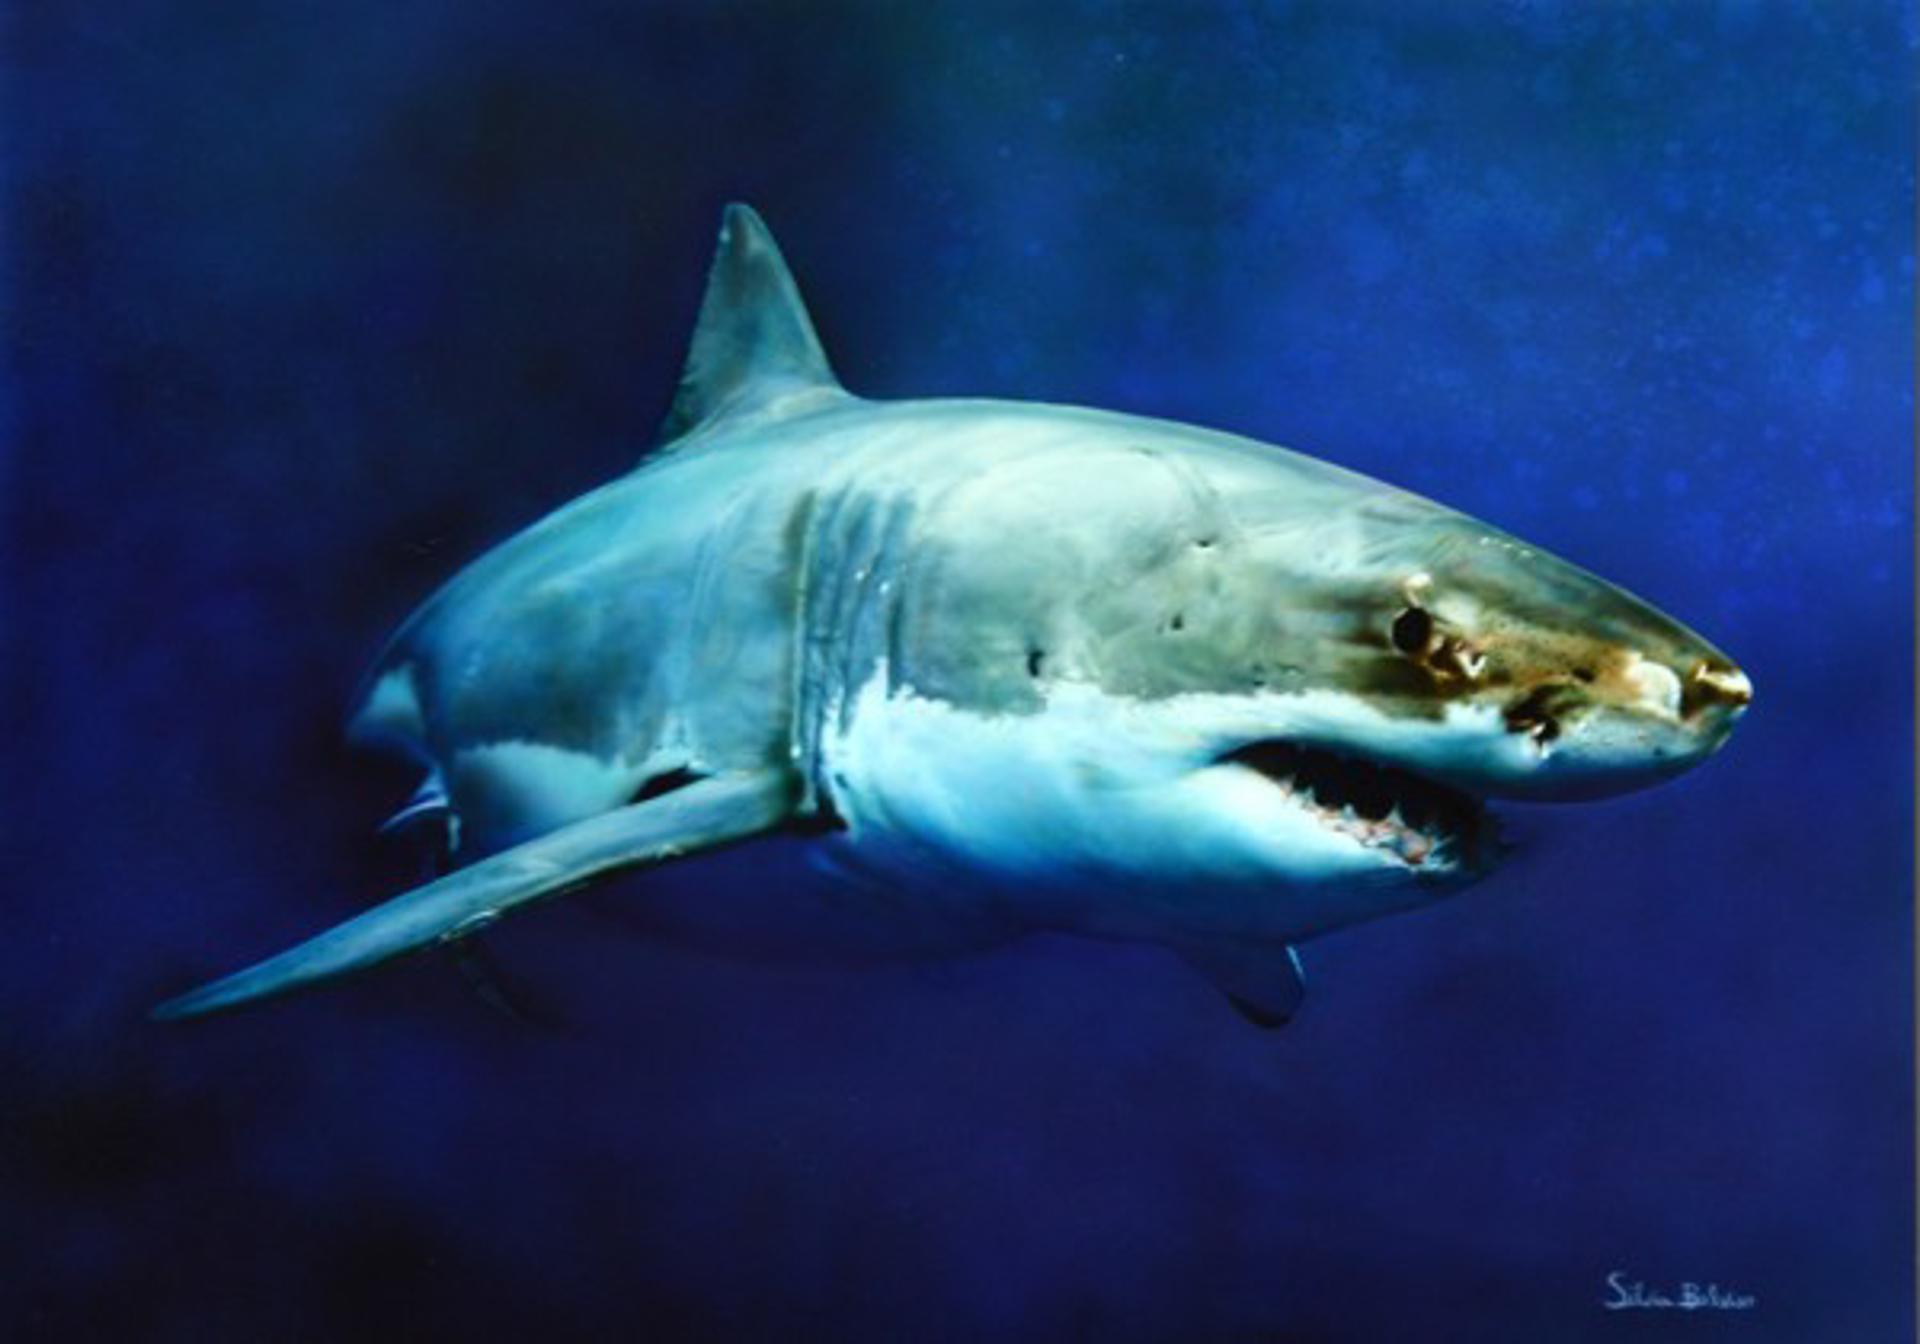 White Shark by Silvia Belviso